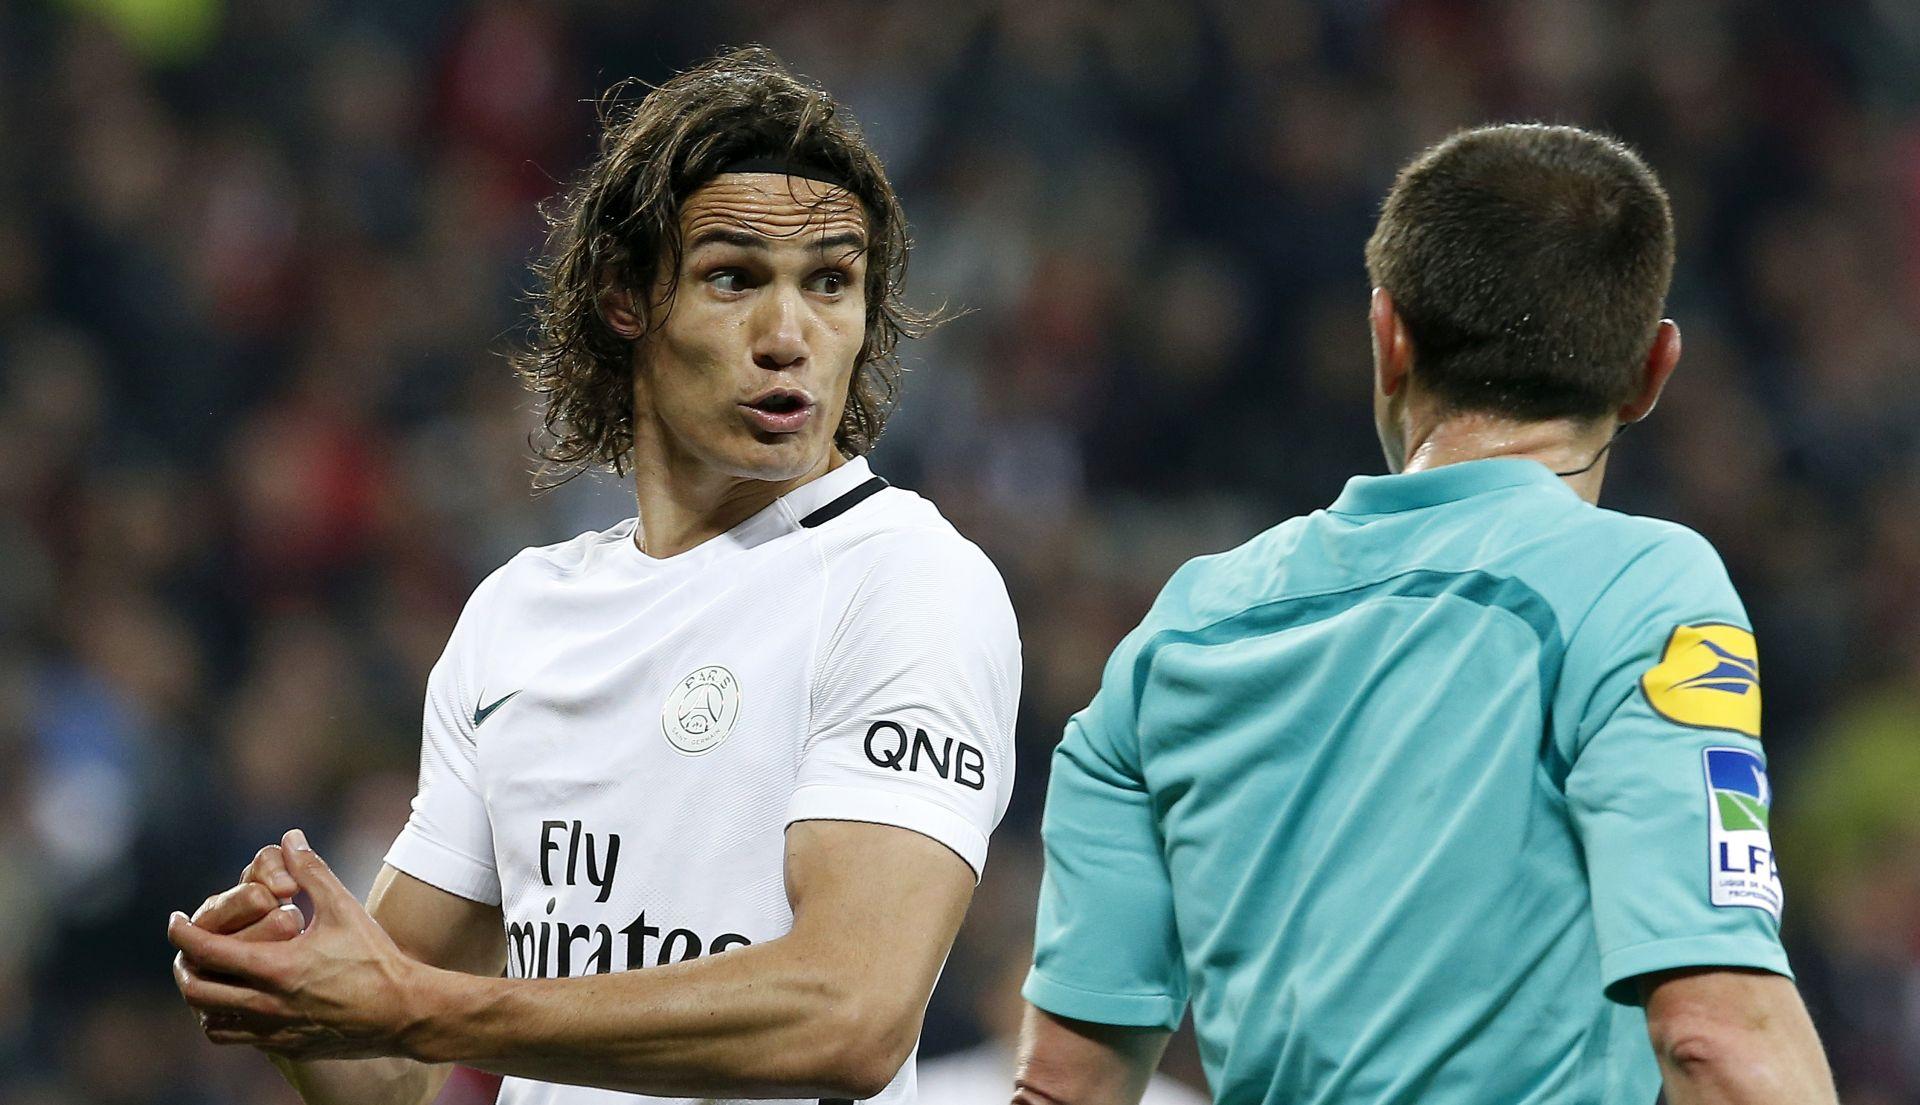 LIGUE 1 Nica slavila protiv PSG-a i 'gurnula' Monaco prema naslovu prvaka